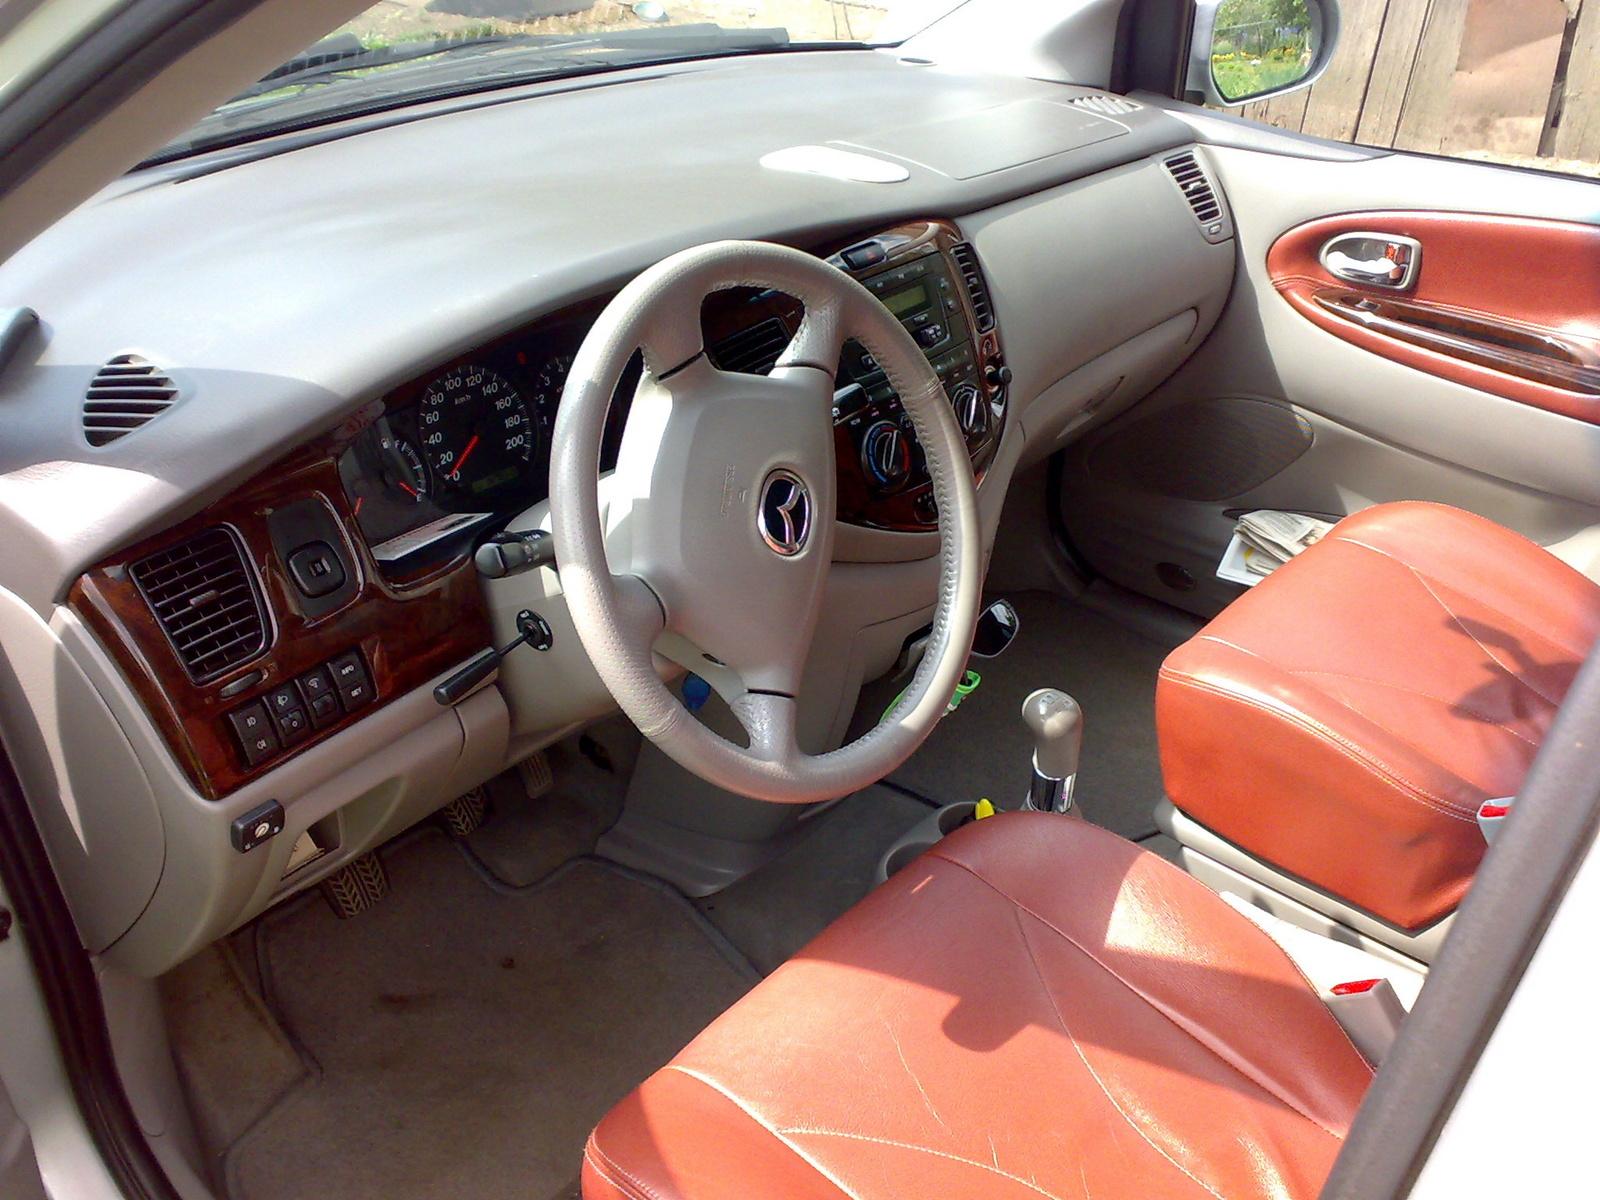 2001 mazda mpv image 16 rh zombdrive com Mazda 8 2006 Mazda MPV